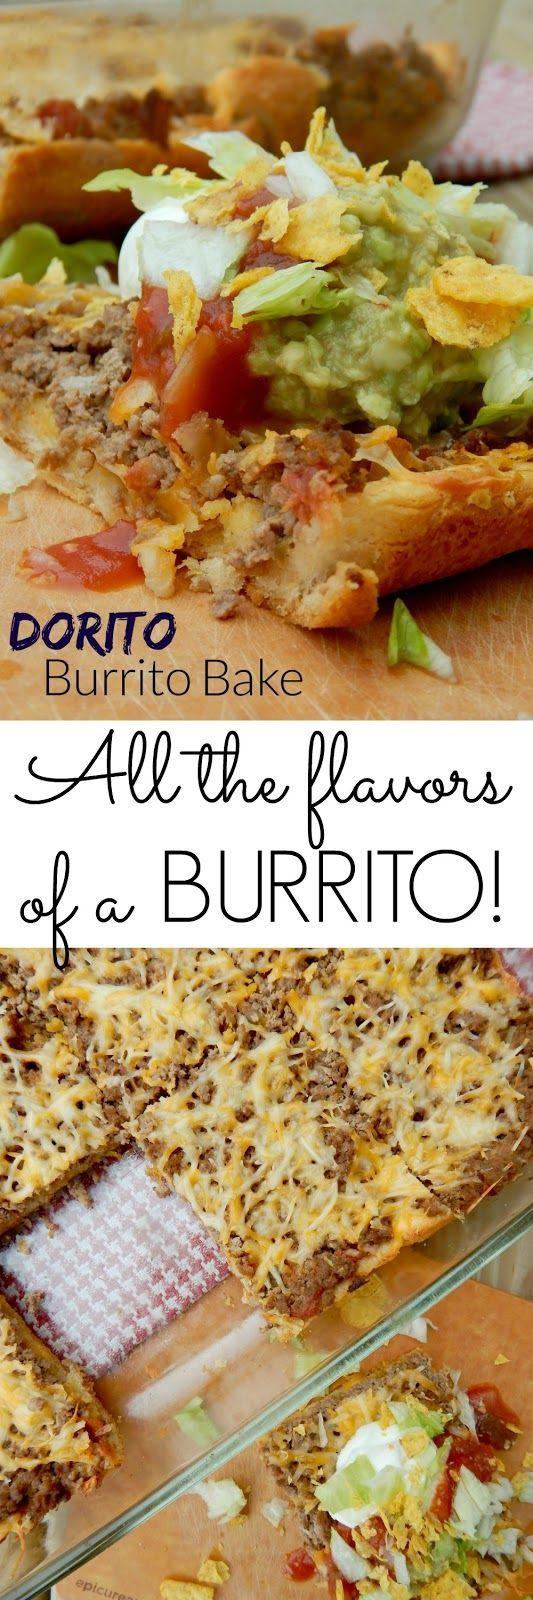 Dorito Burrito Bake...tastes just like a burrito, but so much easier to make!